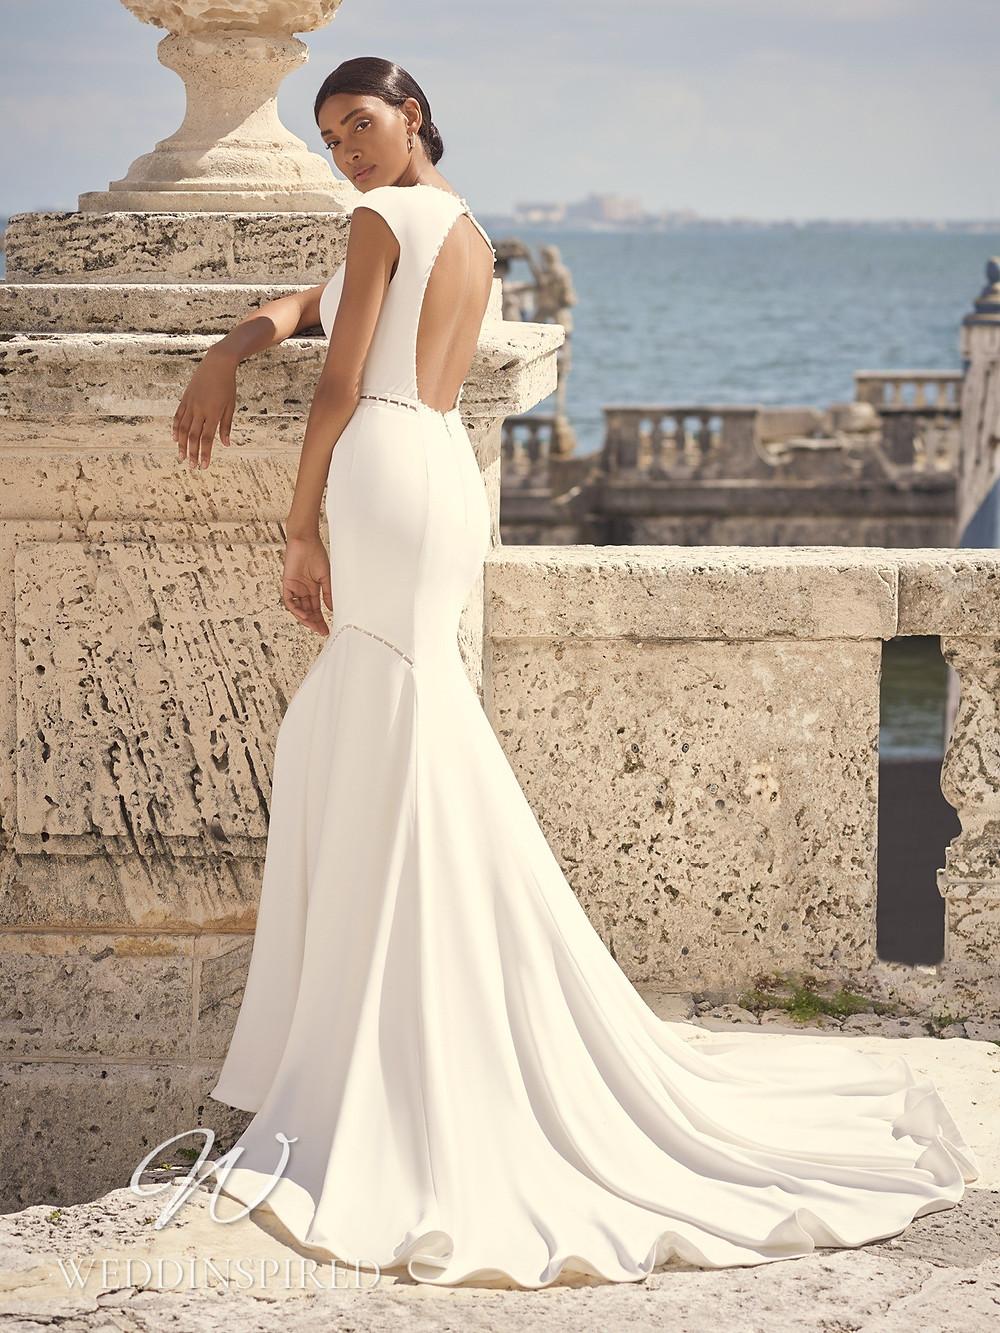 A Sottero & Midgley 2021 simple crepe mermaid wedding dress with a keyhole back